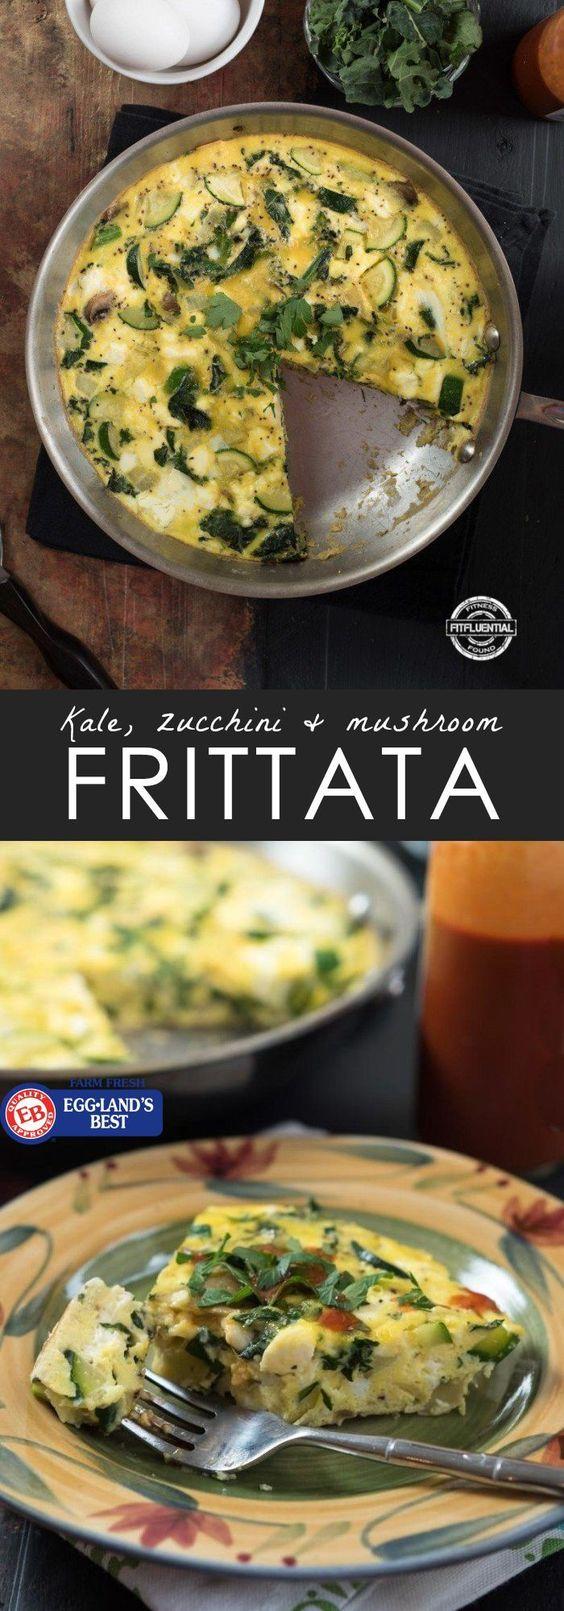 Kale, Zucchini and Mushroom Frittata | Recipe | Kale, Zucchini and ...